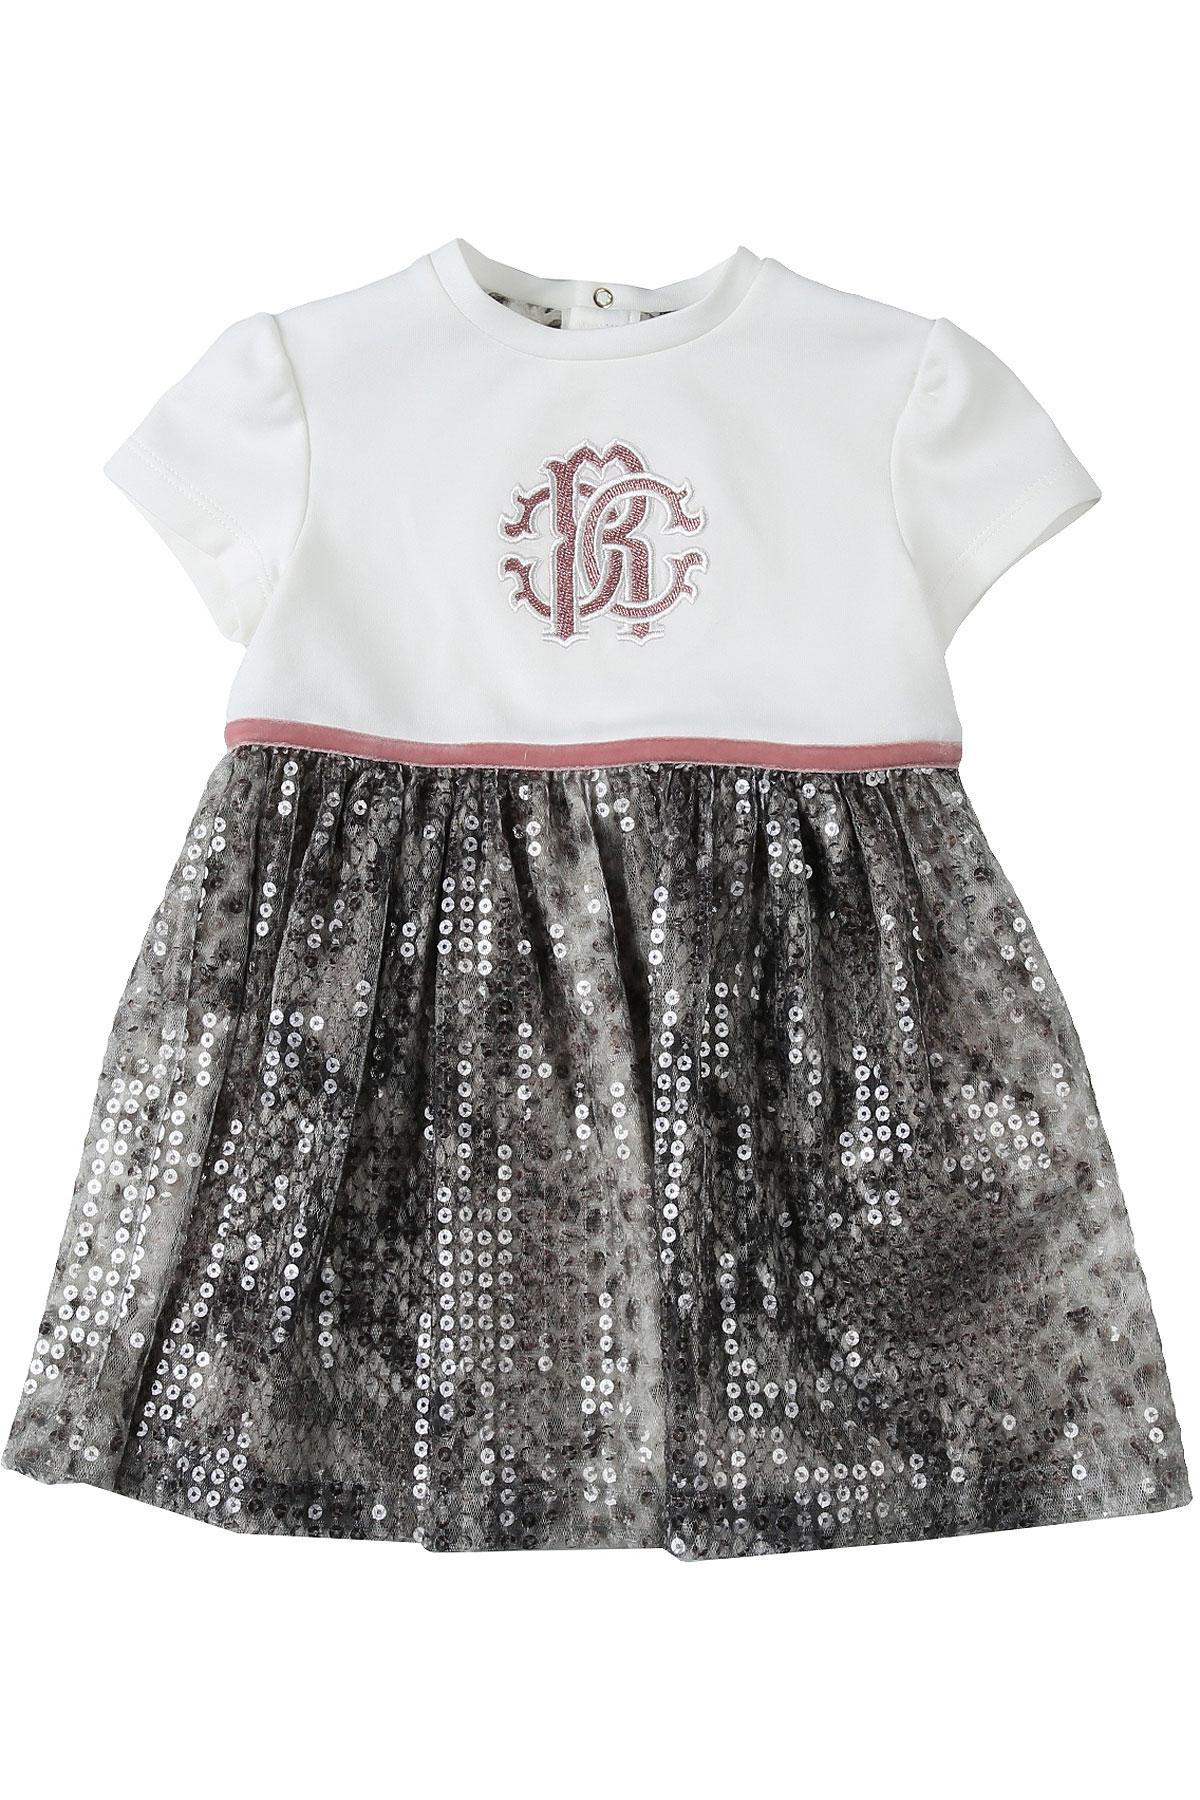 Roberto Cavalli Baby Dress for Girls On Sale, Cream, Cotton, 2019, 12M 18M 2Y 3Y